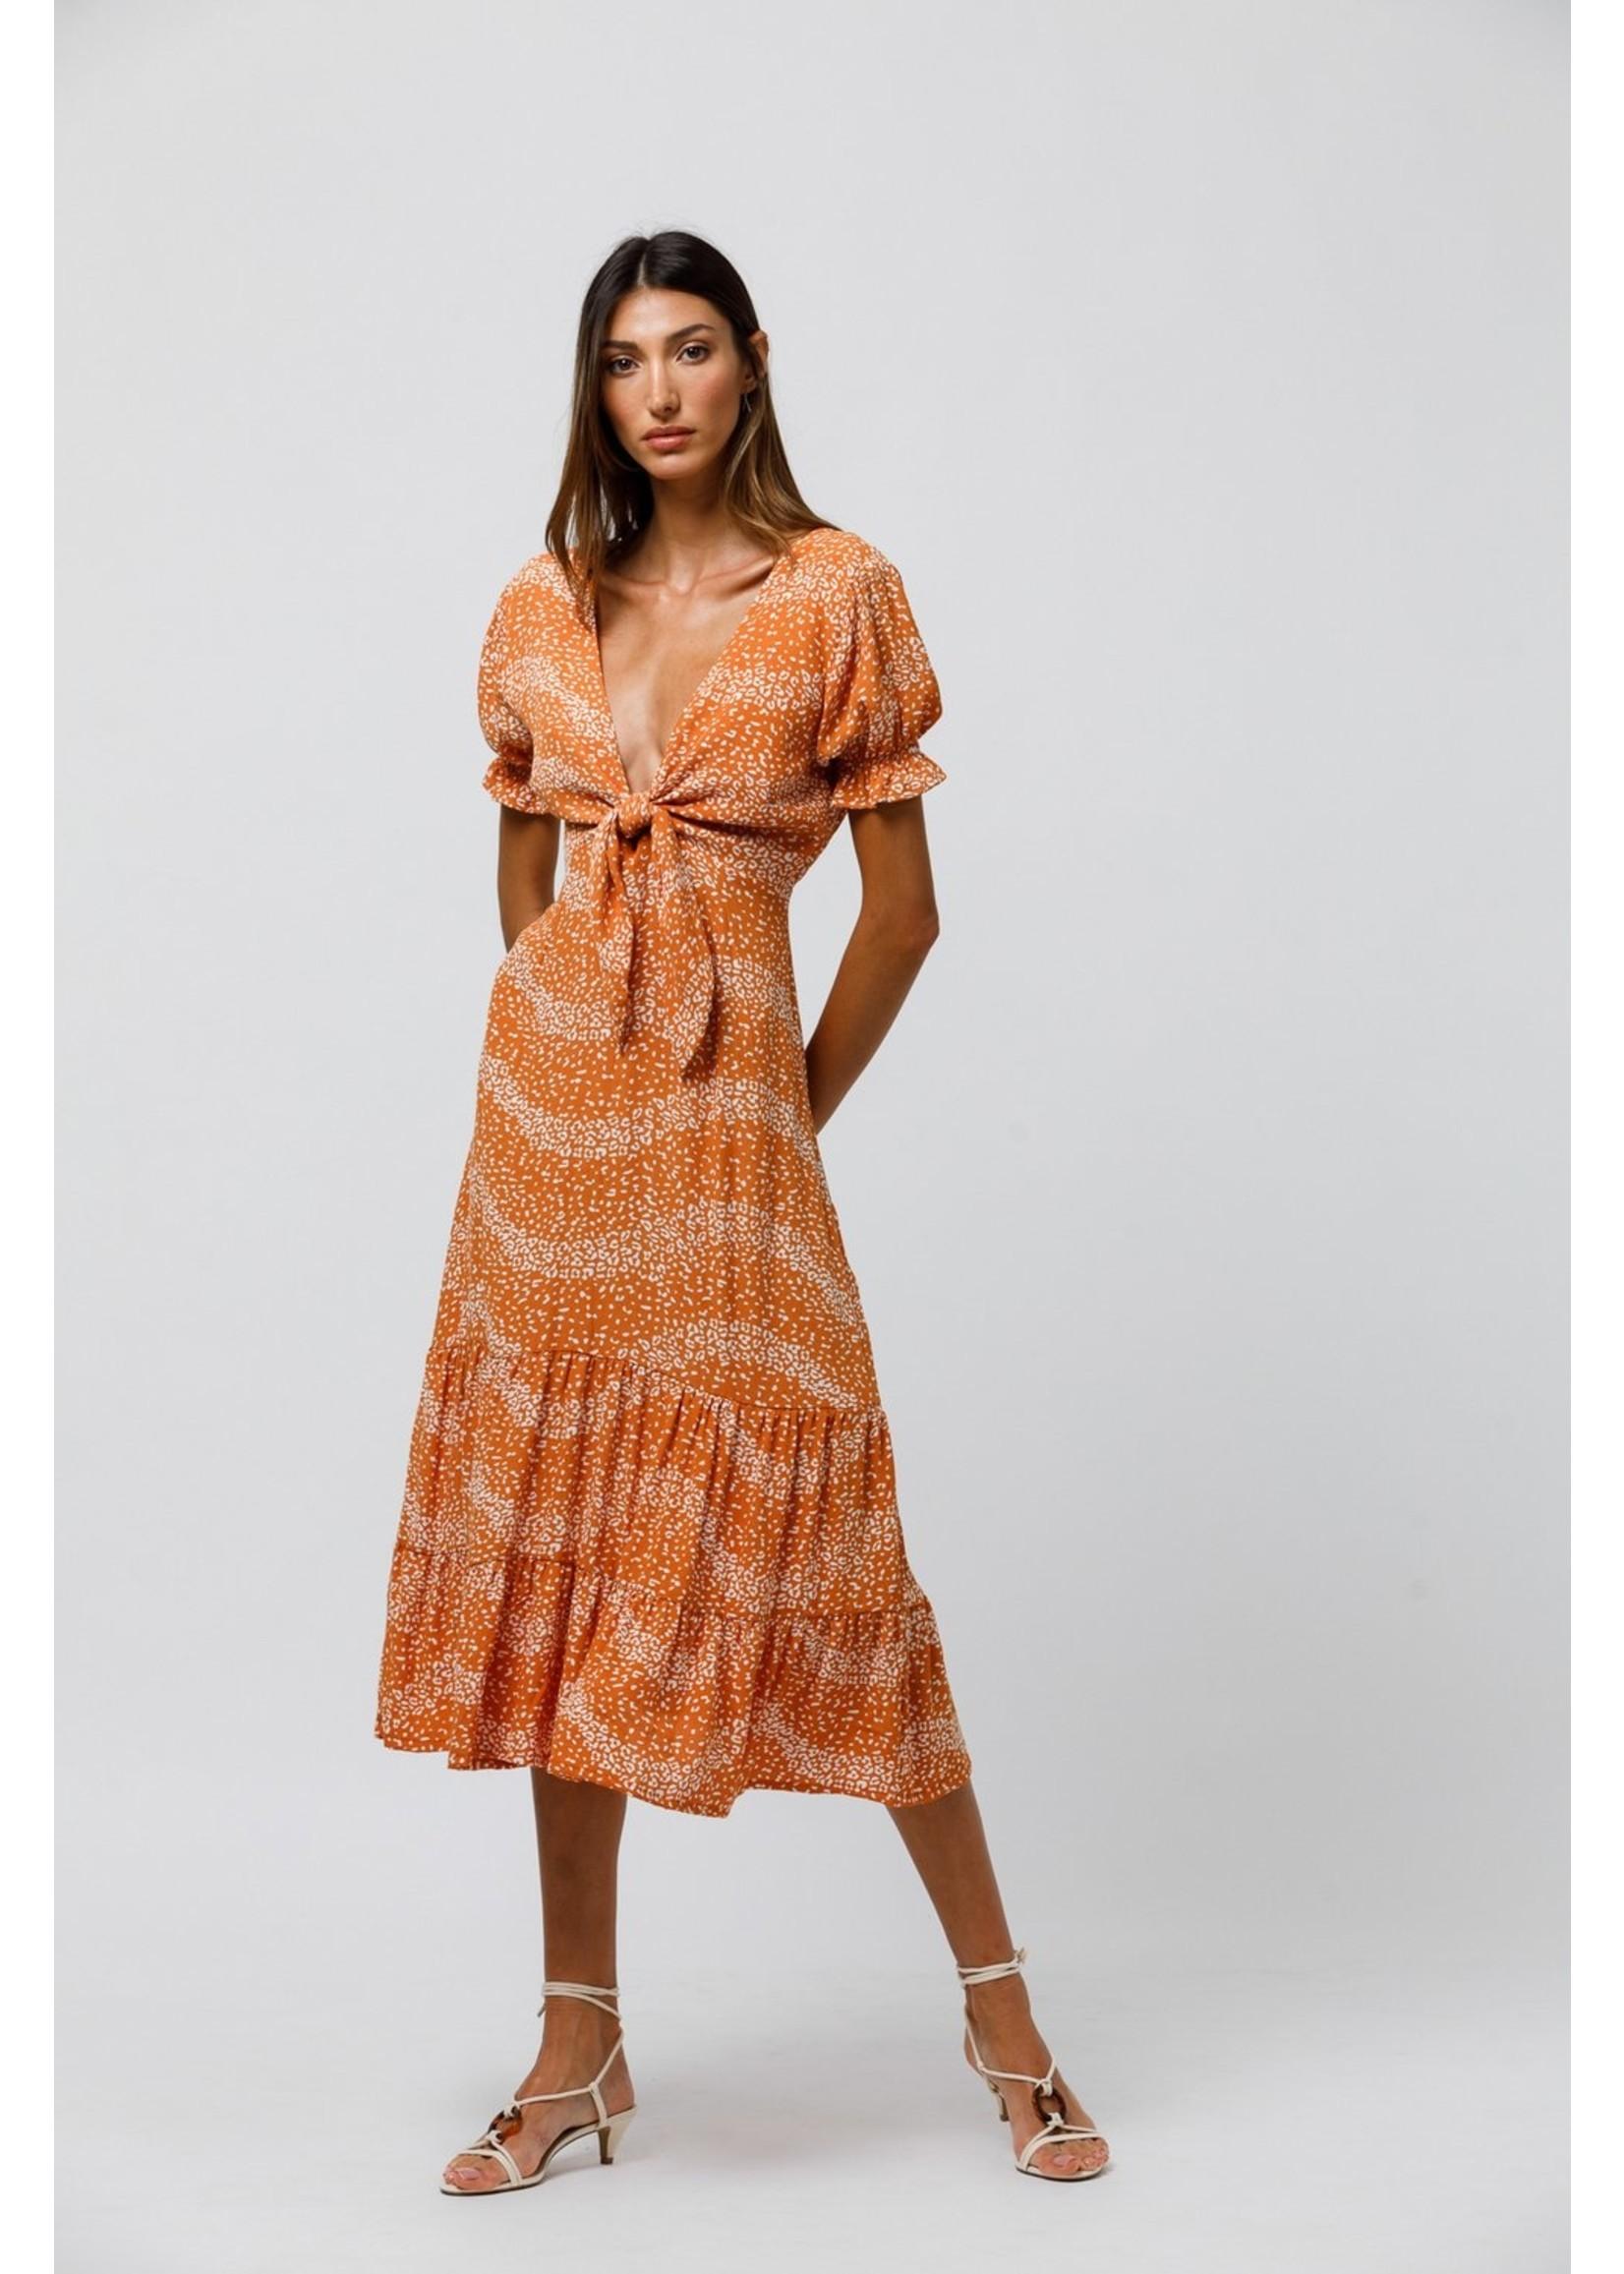 Beachgold Danny Dress